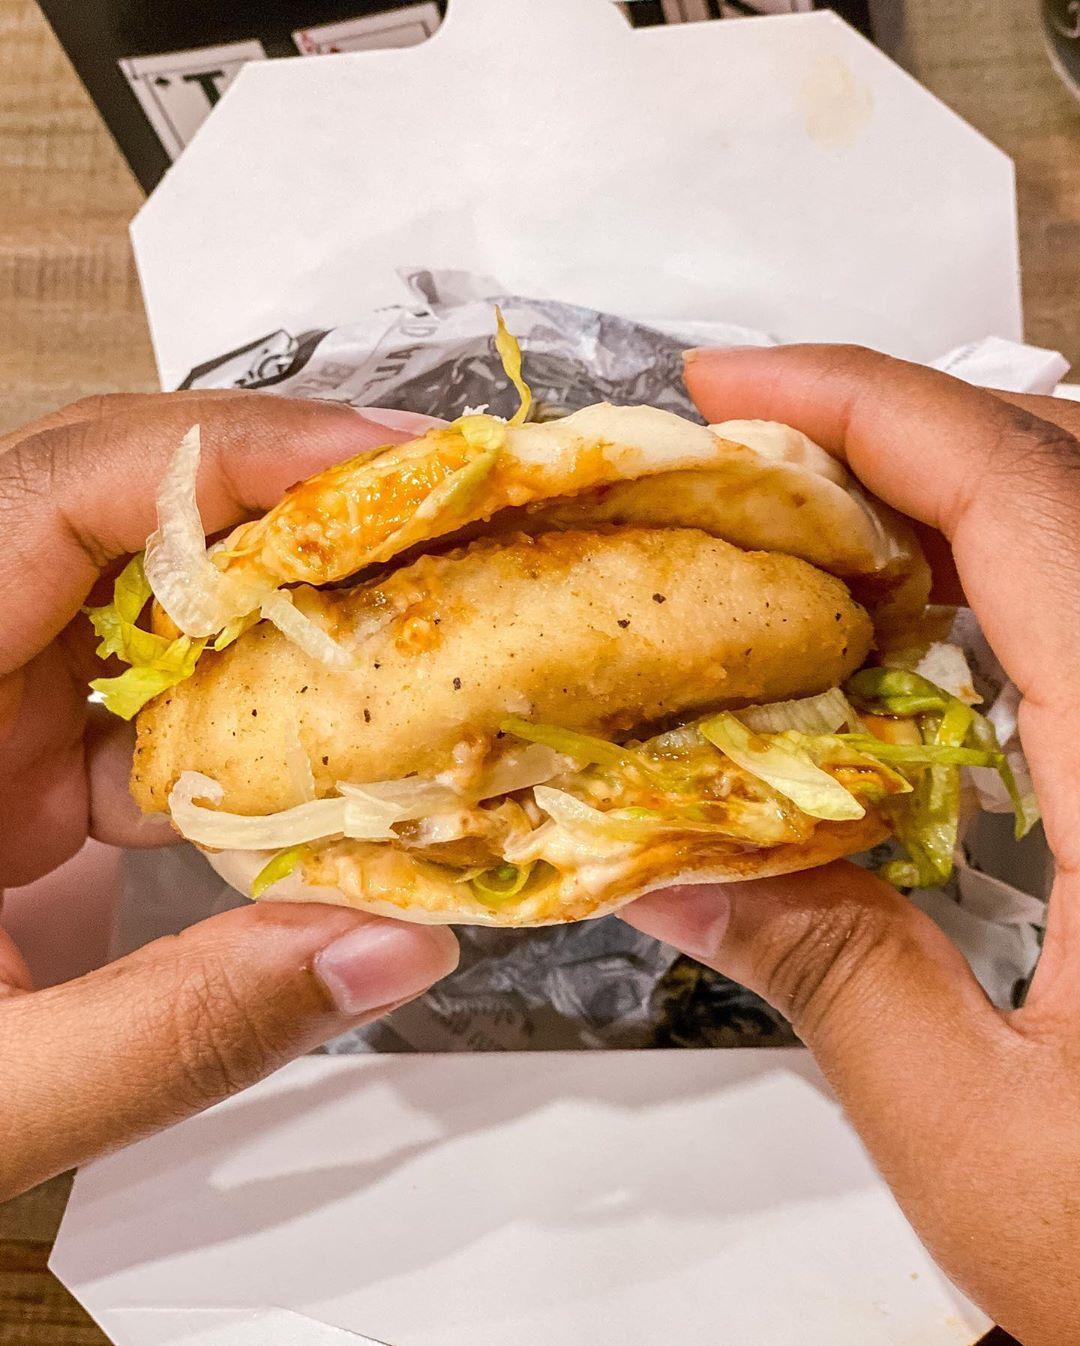 Jaqks Chicken Chips Halal Wow Bao Original Jaqkschickenandchips Birmingham Bham Jaqks Takeaway Friedchi In 2020 Chicken And Chips Halal Recipes Foodie